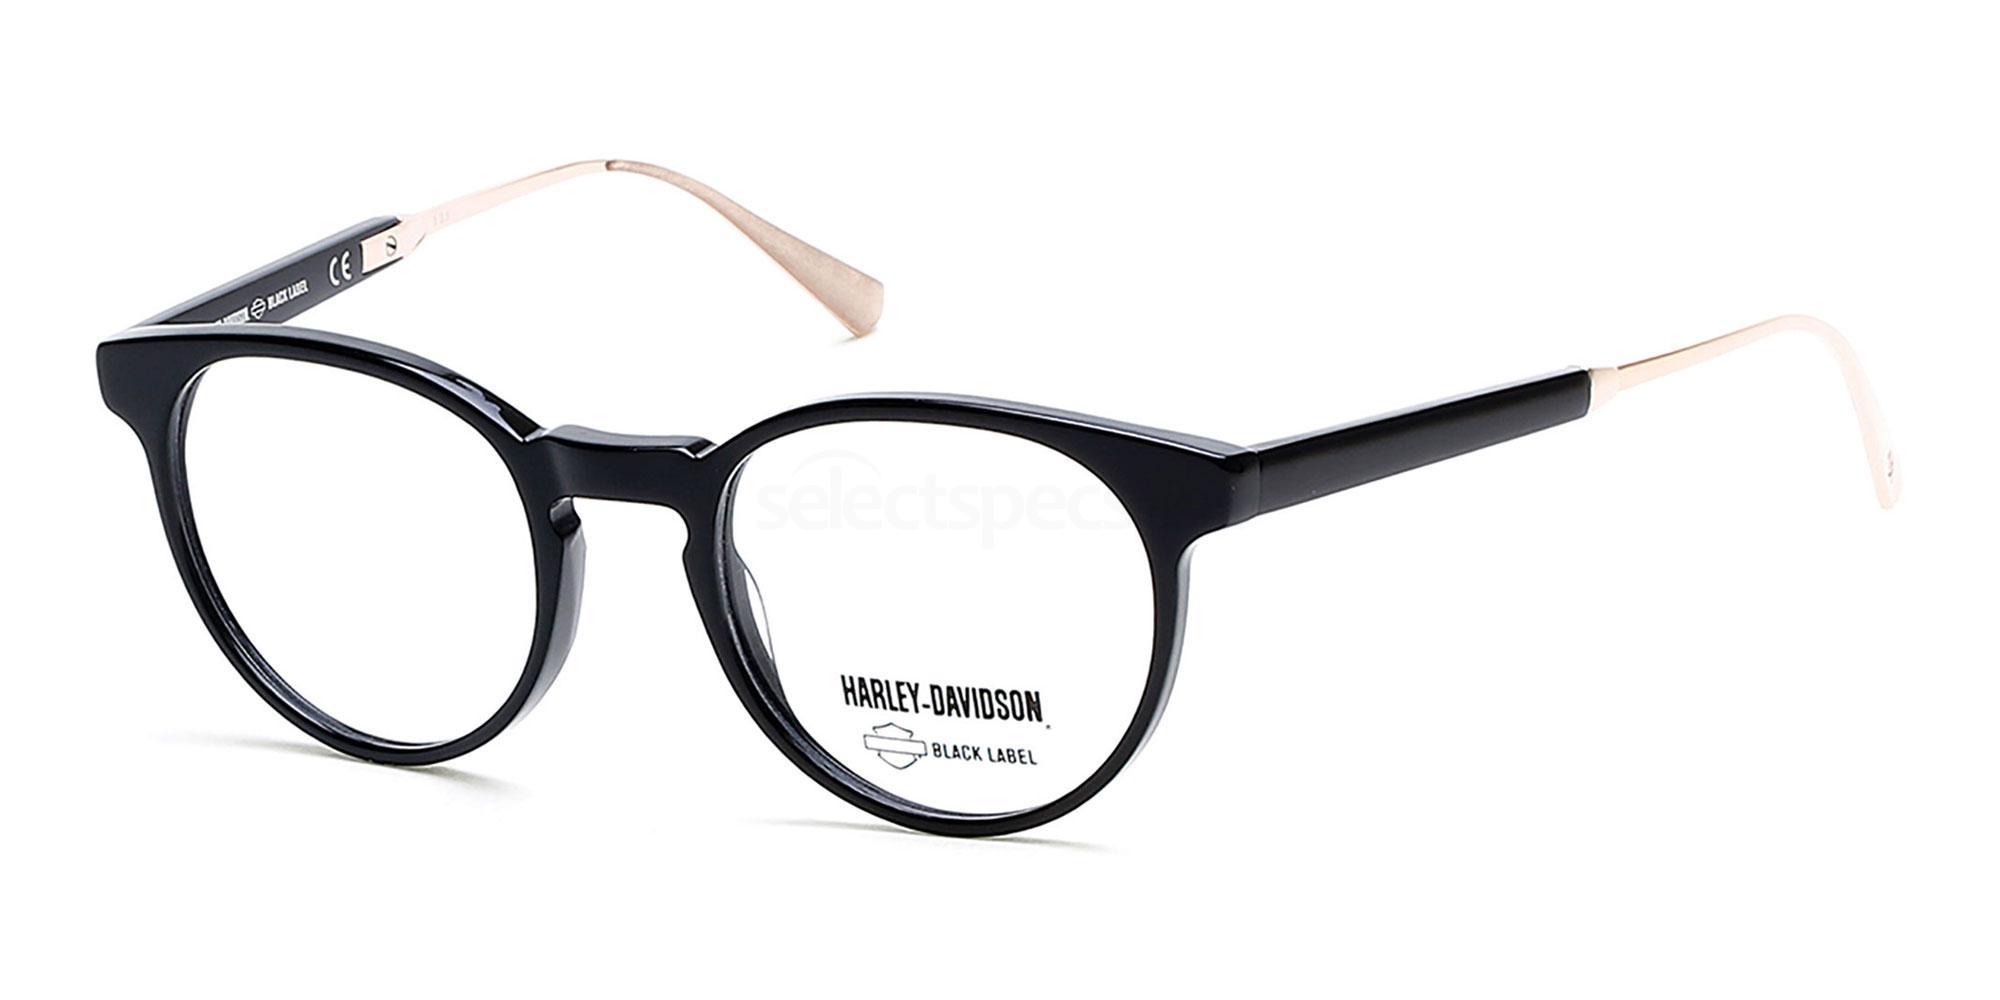 001 HD 1028 Glasses, Harley Davidson